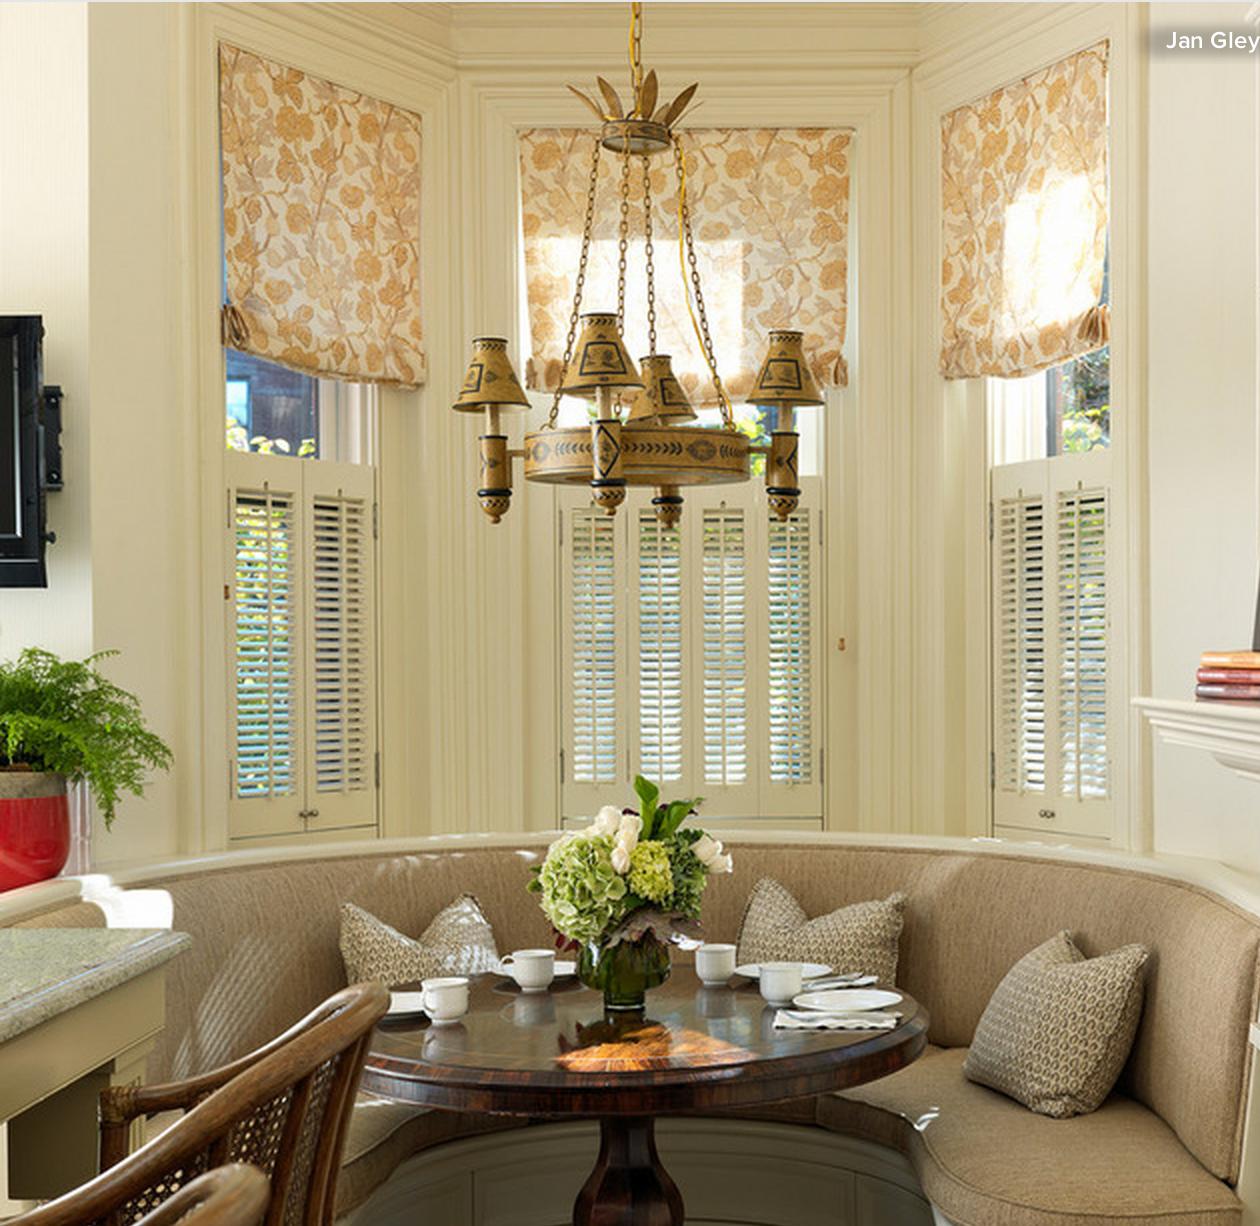 25 Modern Roman Shades For Beautiful Room Decorating: Window Treatment Idea: Roman Shades In A Bay Window